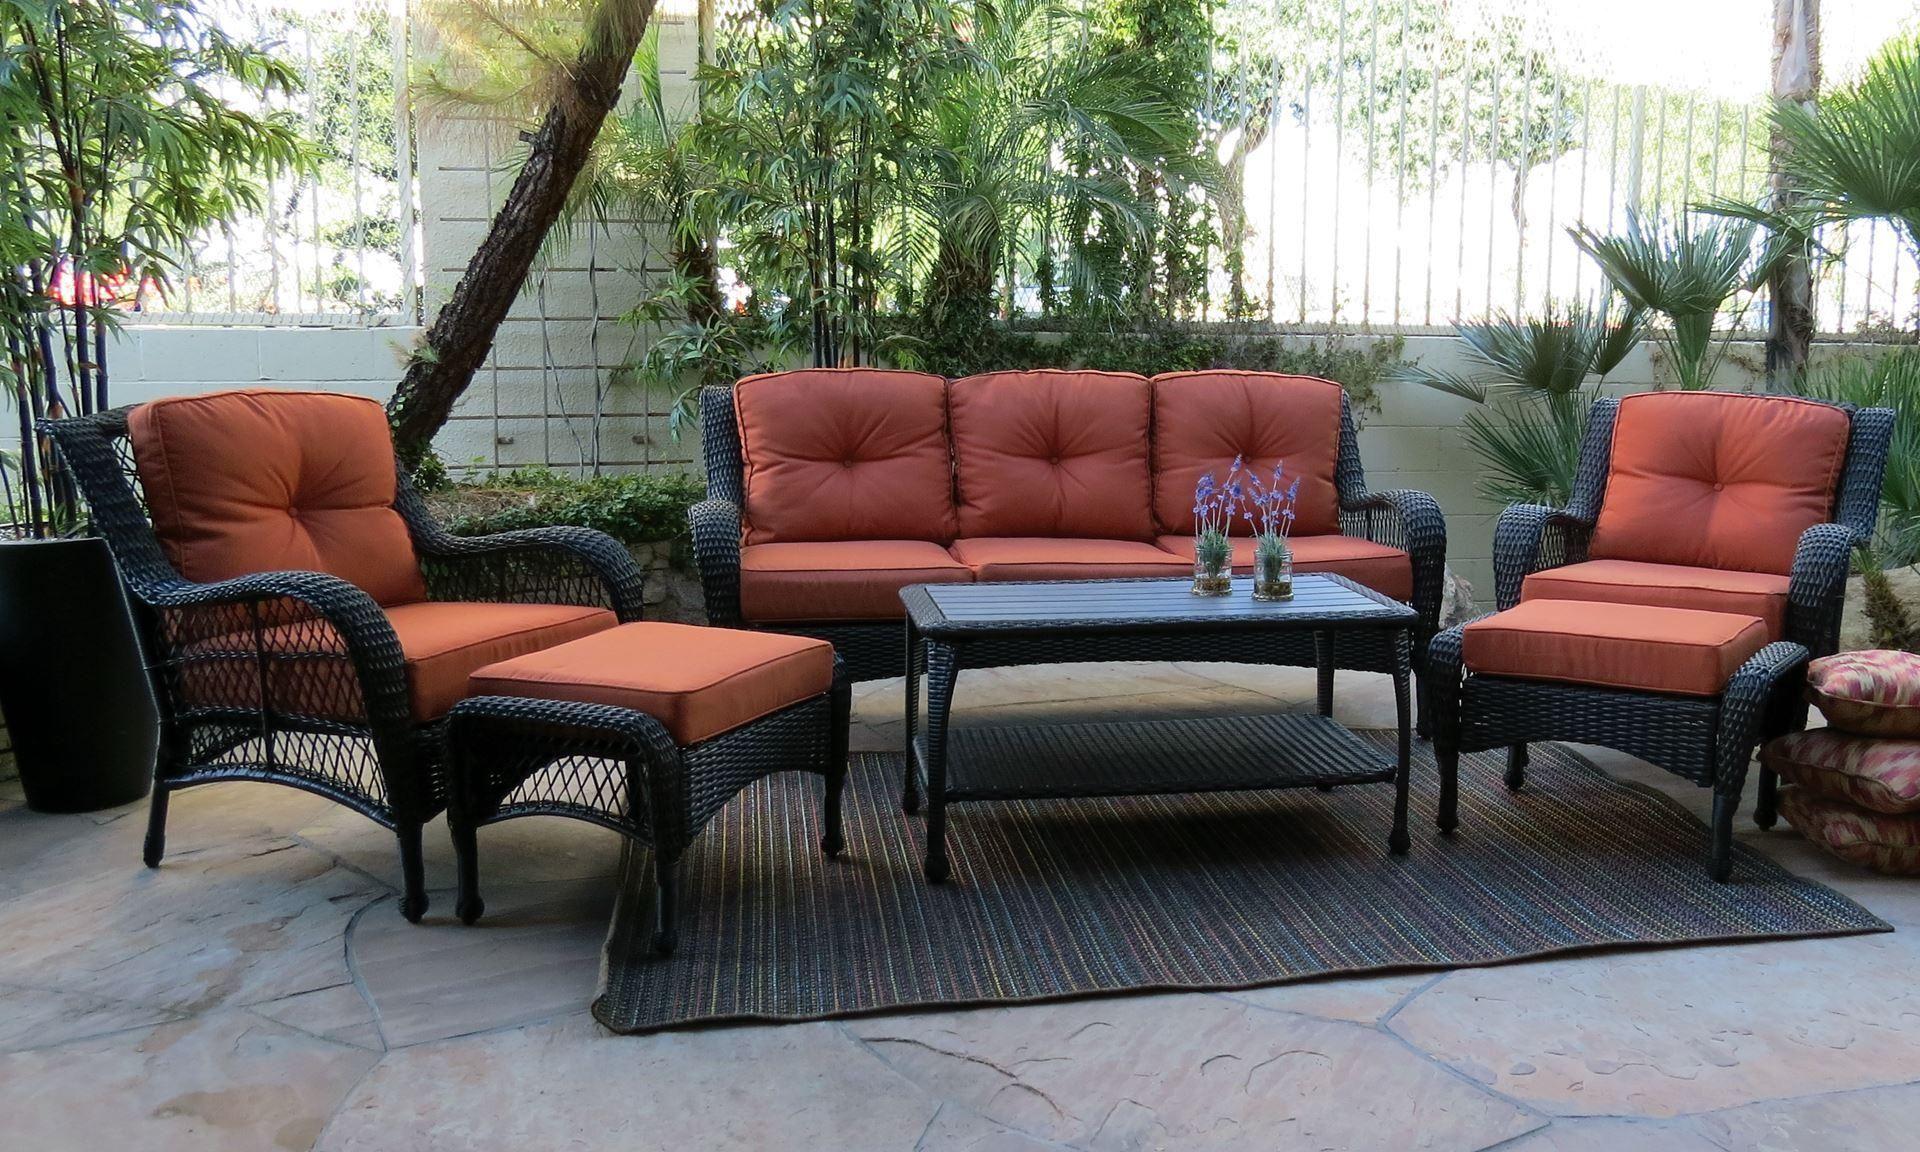 Peachy Outdoor Living Area Furniture Sierra Outdoor Living Room Download Free Architecture Designs Intelgarnamadebymaigaardcom